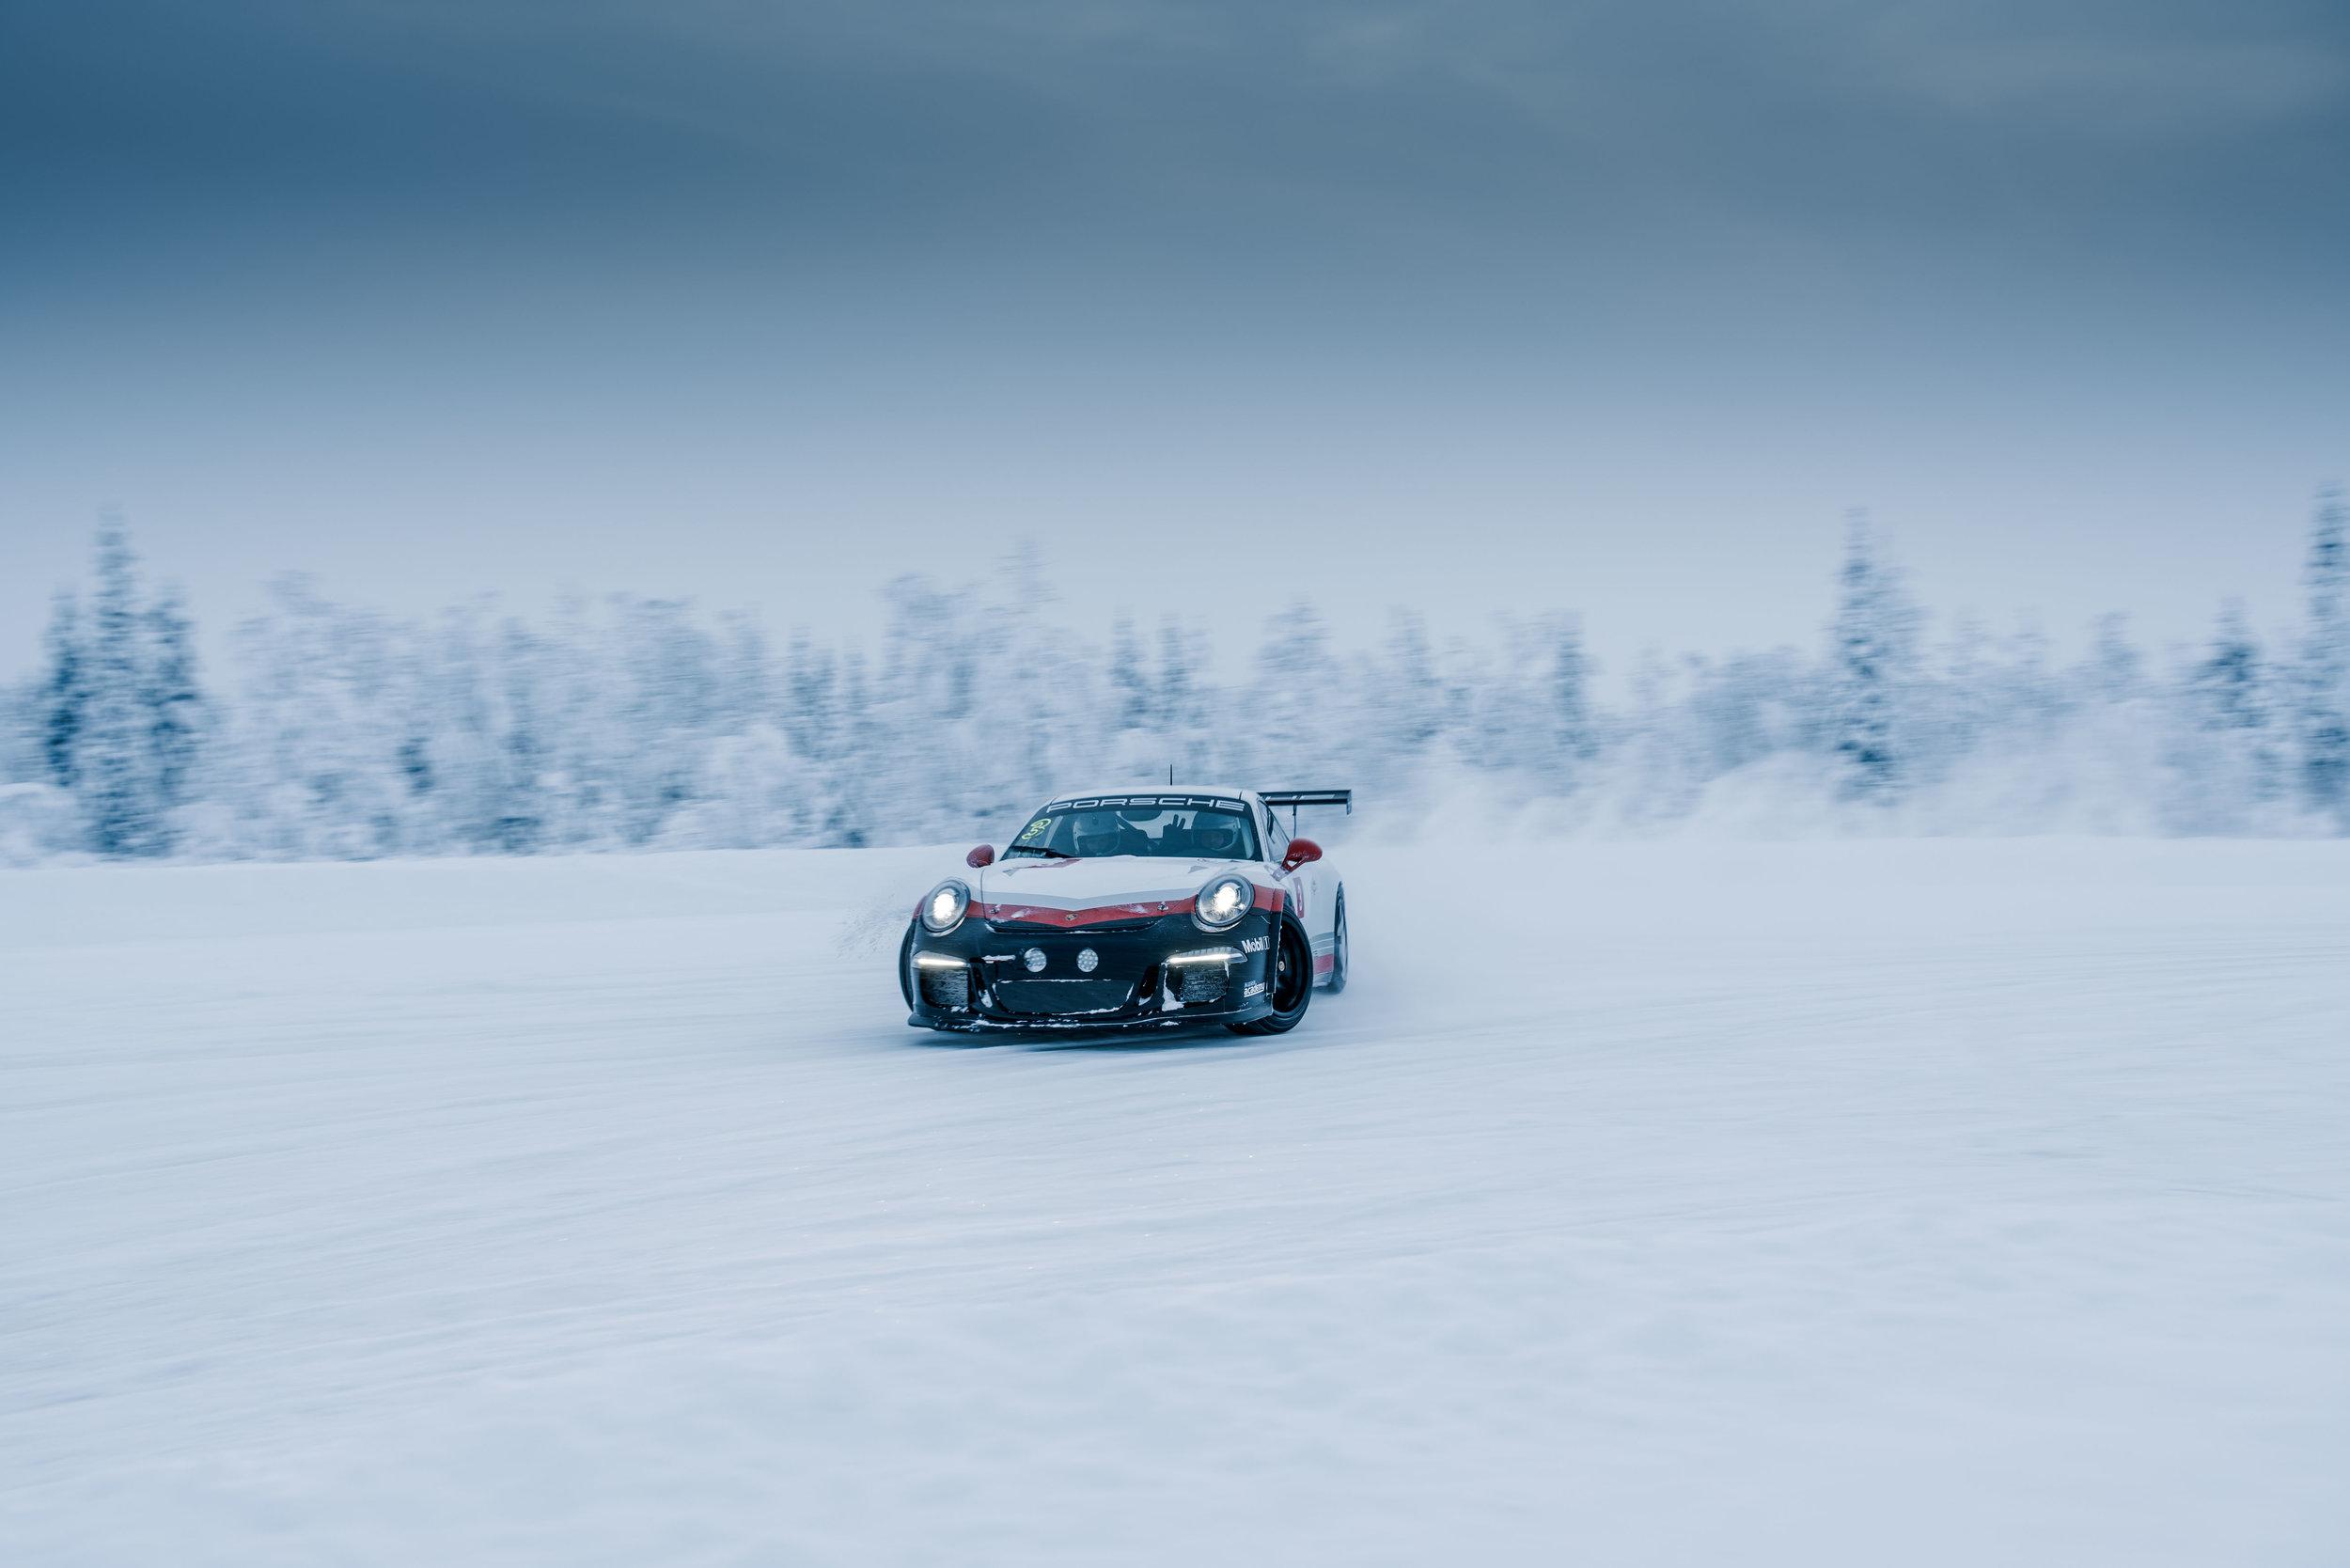 Porsche Ice Experience on Ice_30_01_2019_0468_175681.jpg